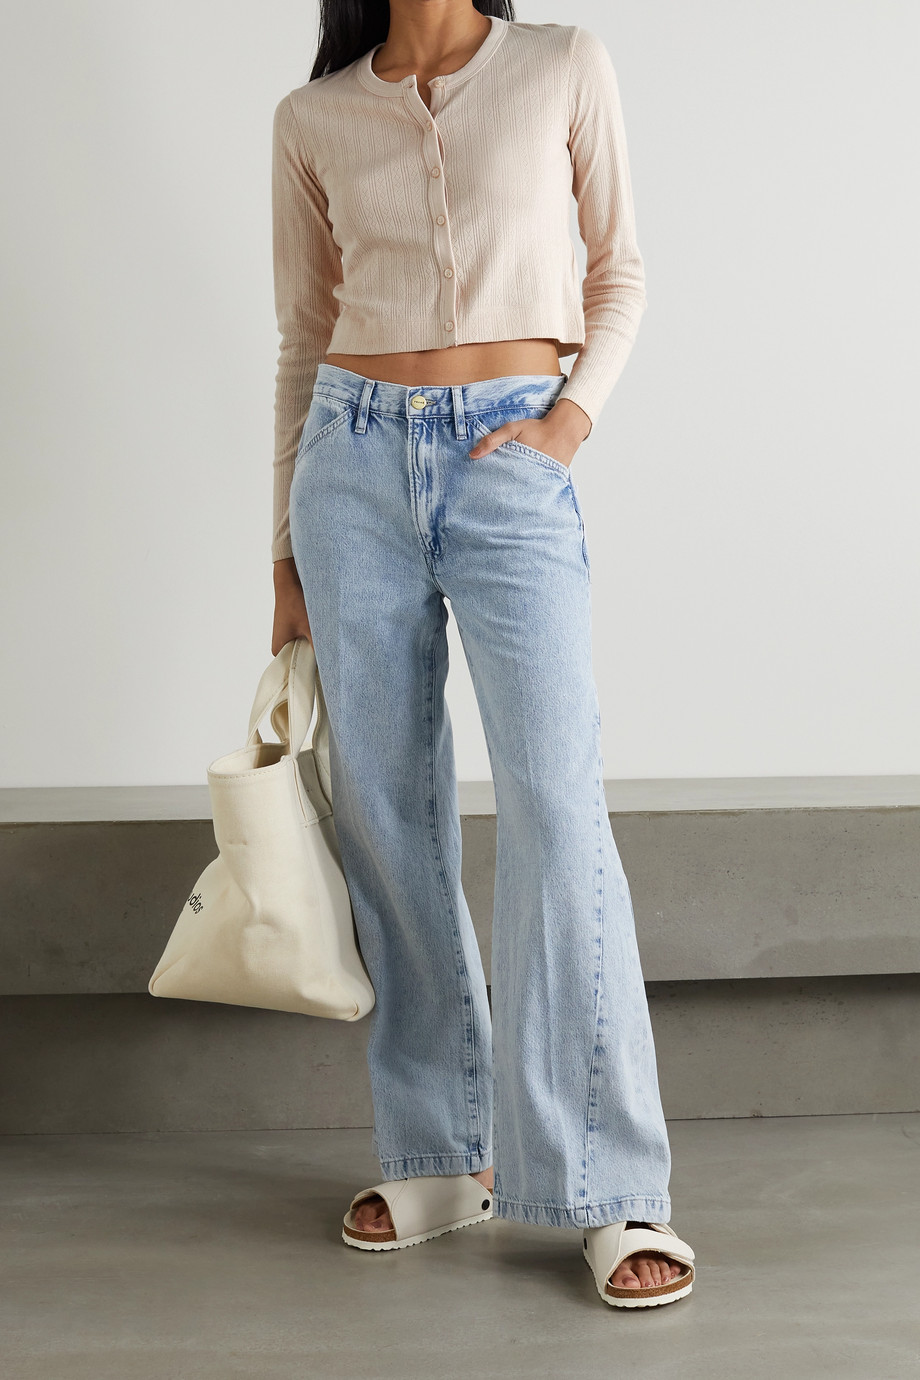 Ninety Percent + NET SUSTAIN pointelle-knit organic cotton cardigan